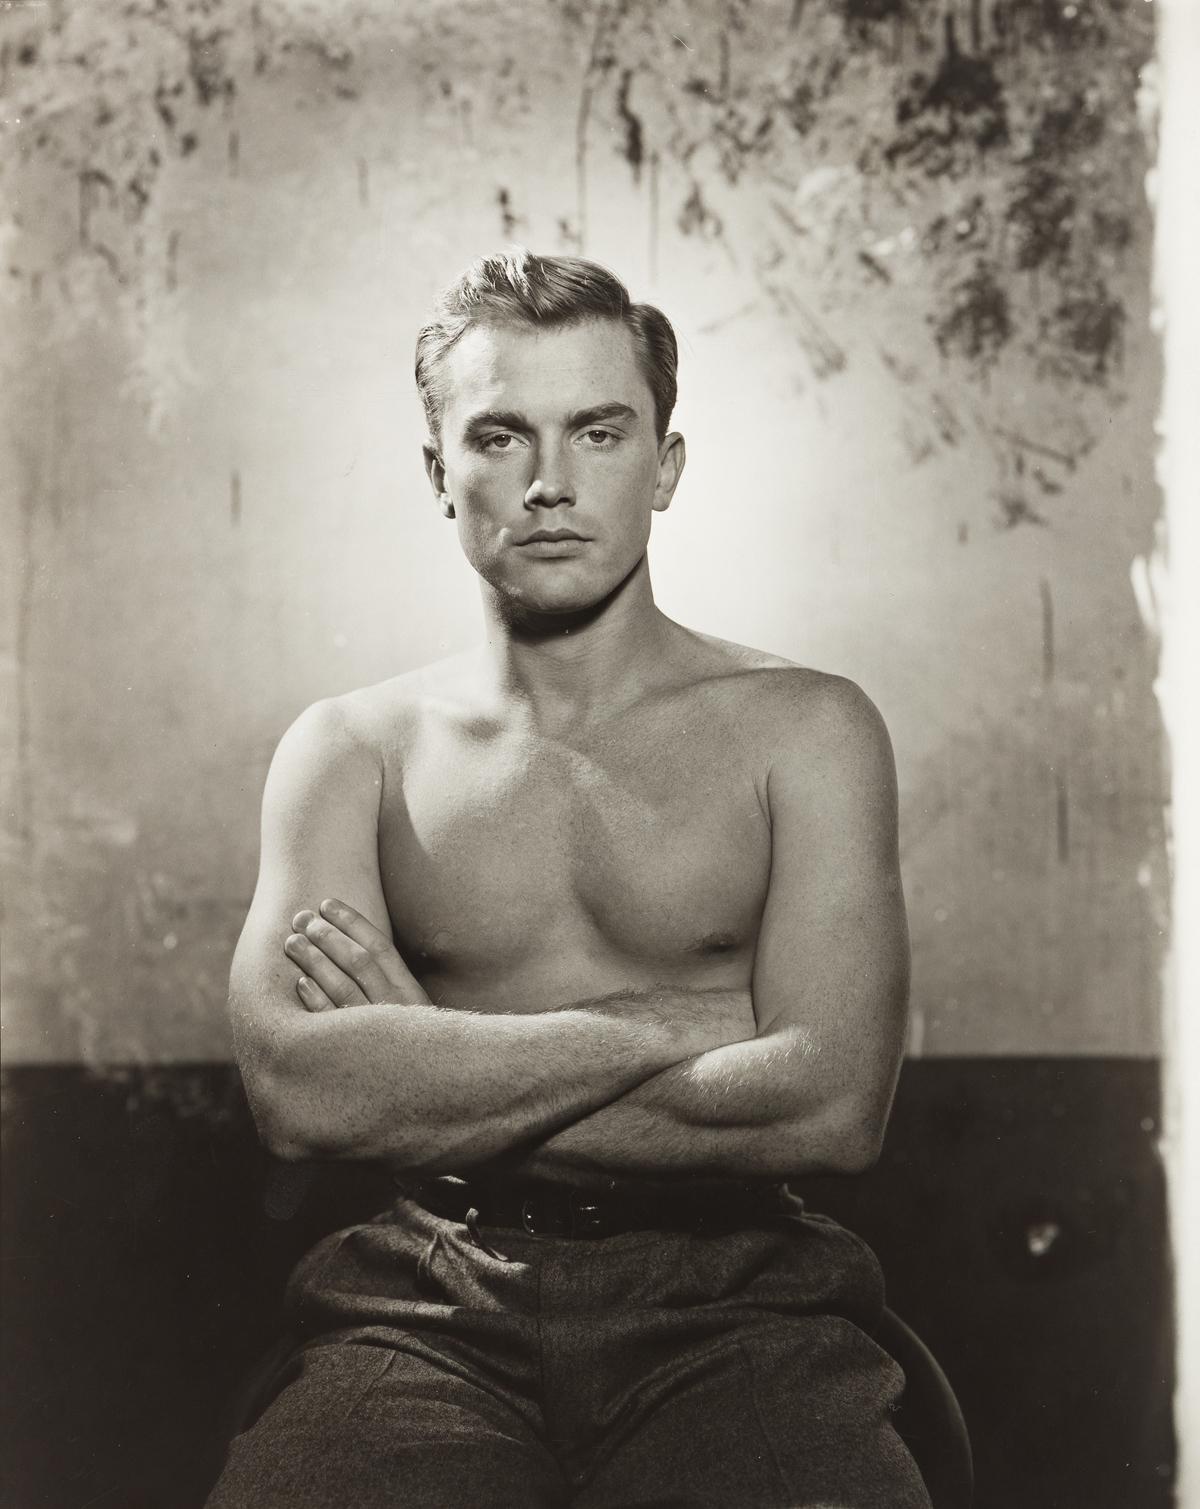 GEORGE PLATT LYNES (1907-1955) Alexander Jensen Yow.